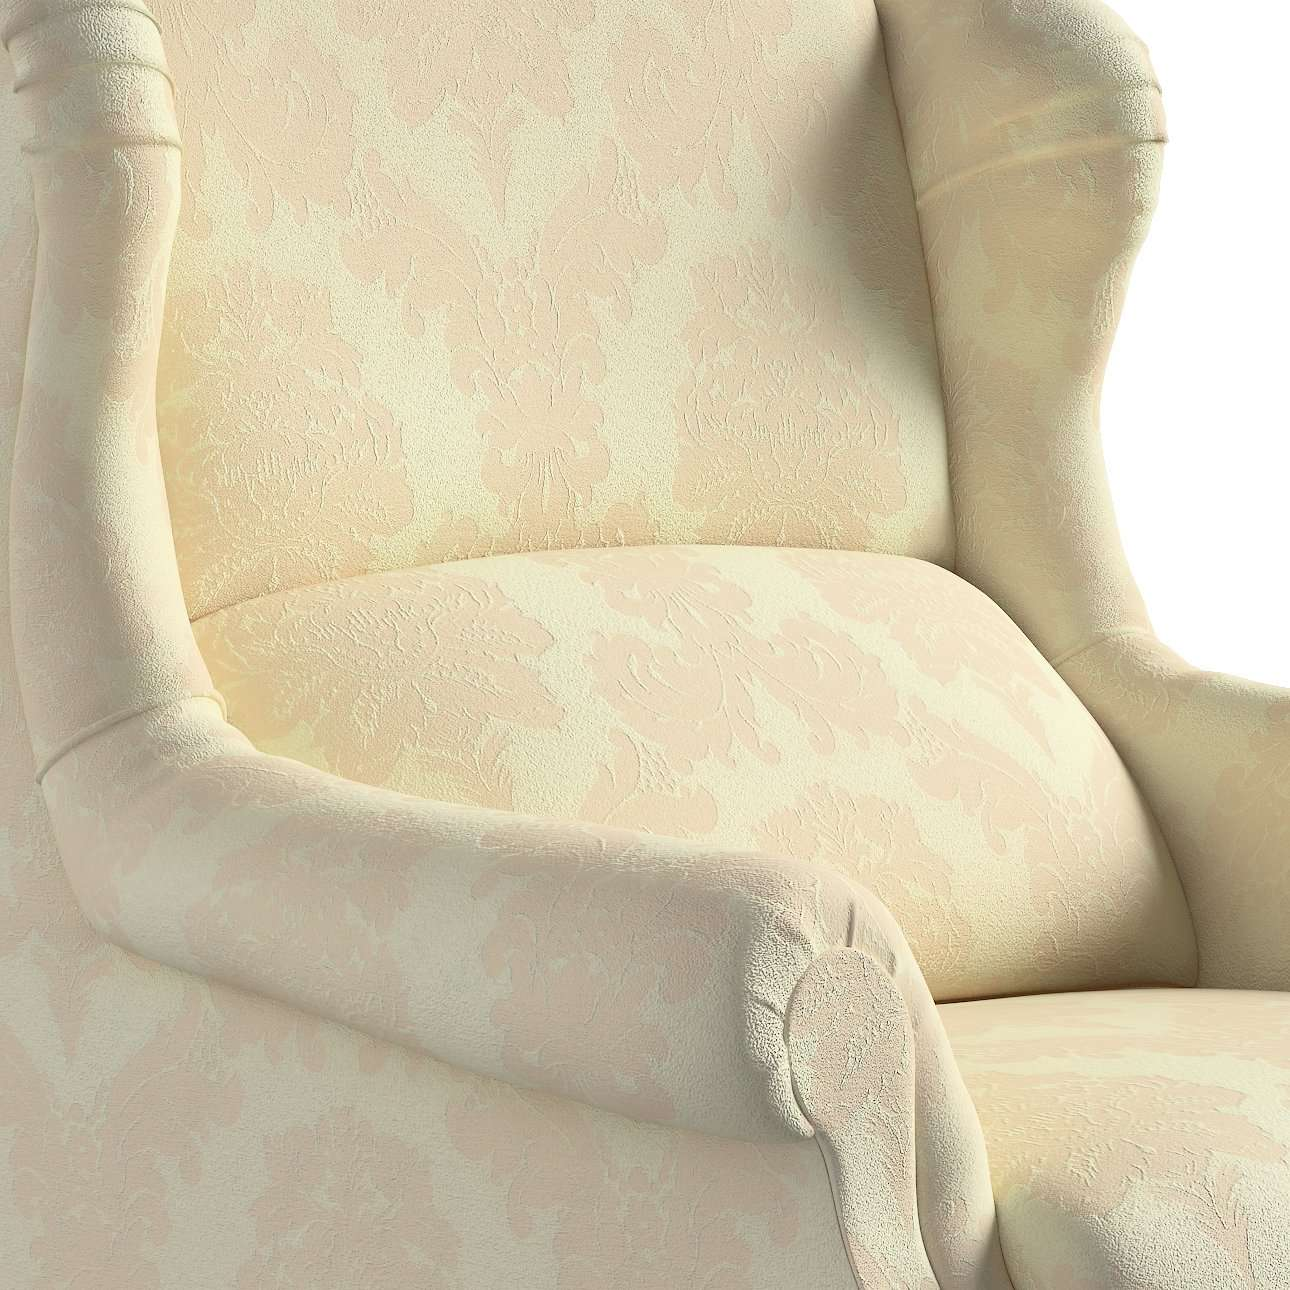 Stilingas Dekoria fotelis 63 x 115 cm kolekcijoje Damasco, audinys: 613-01